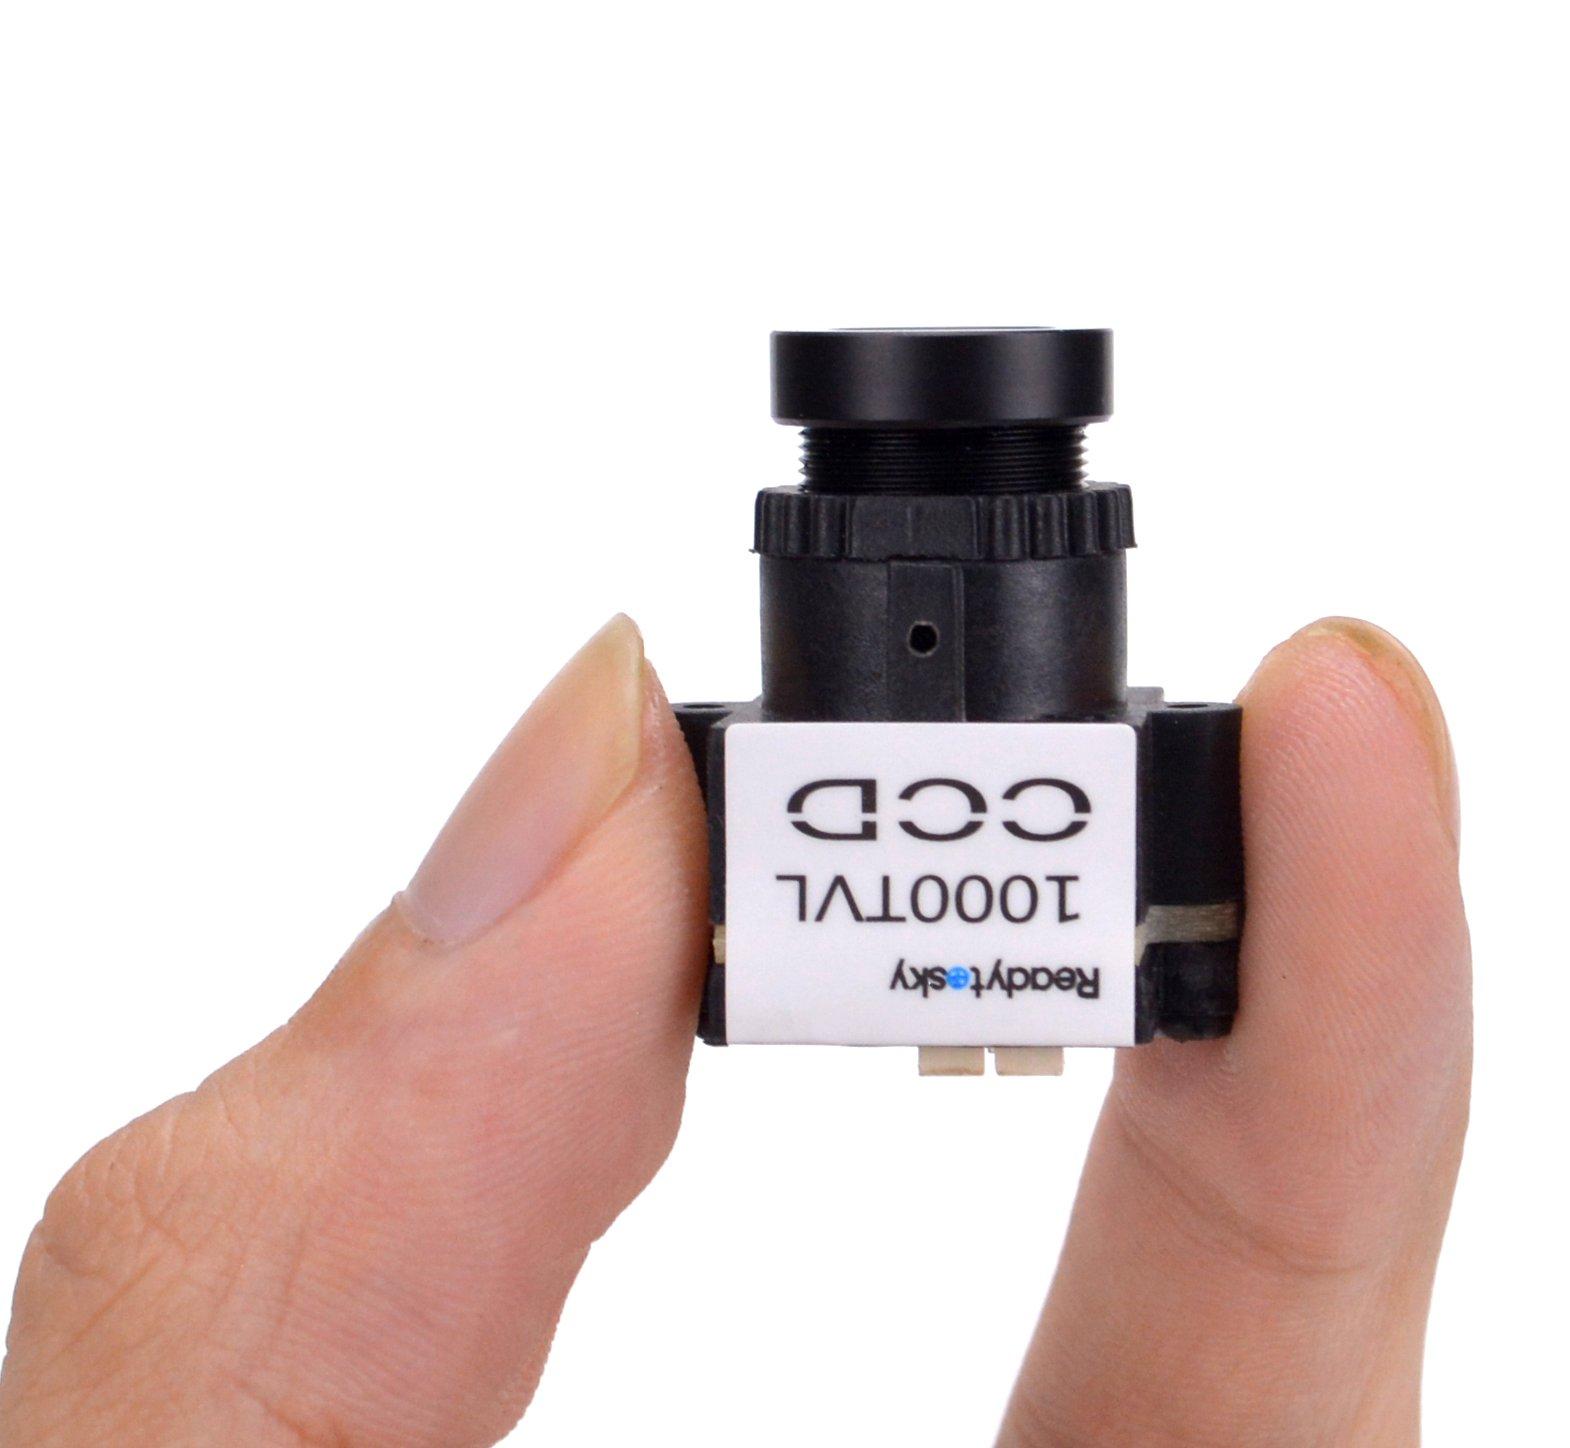 Readytosky HD FPV Camera 1000TVL 1/3 CCD 110 Degree 2.8mm Lens Mini NTSC PAL Switchable Camera for FPV Quadcopter by Readytosky